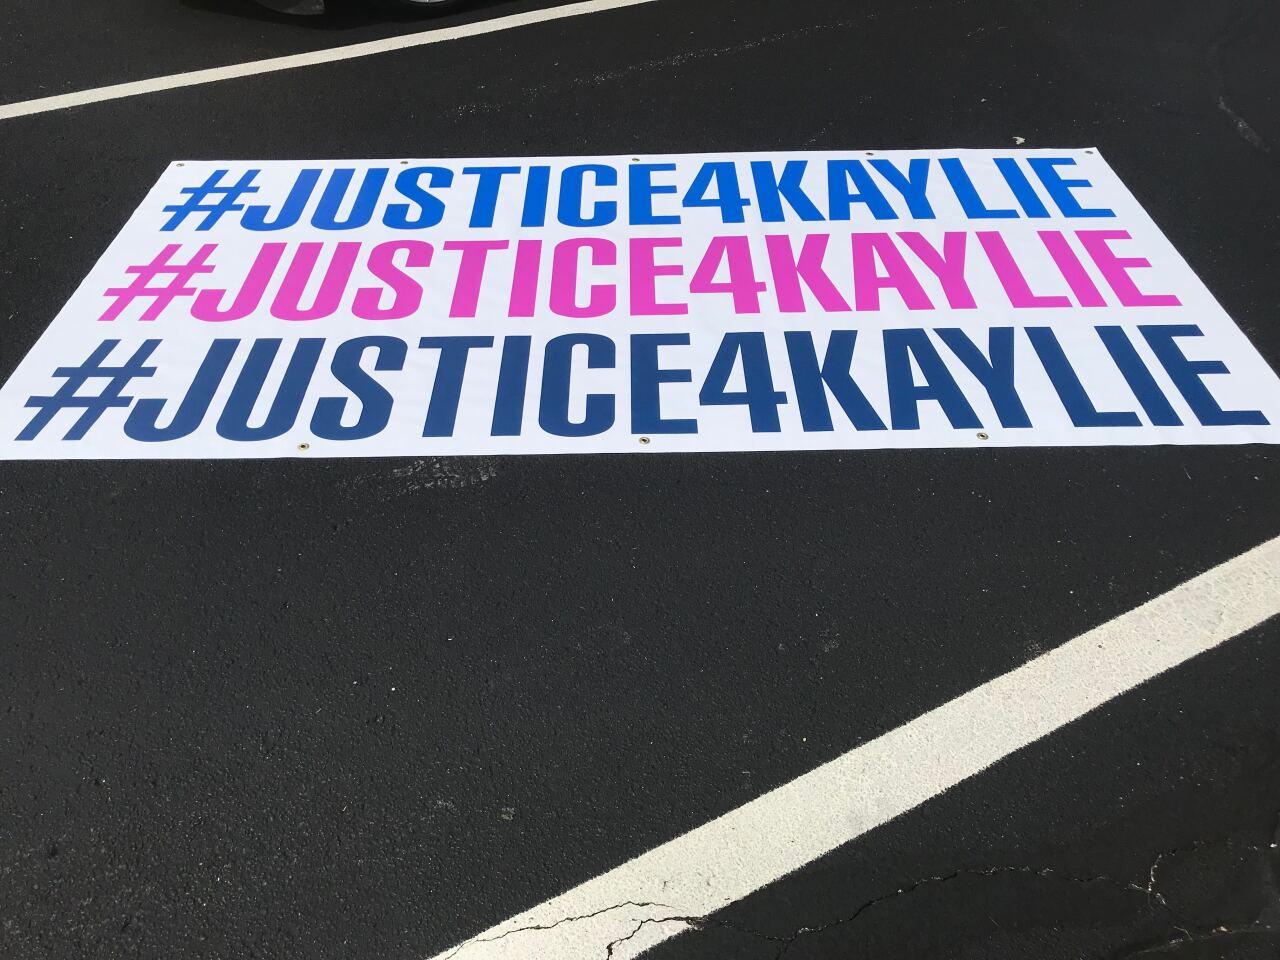 Justice for Kaylie Juga sign